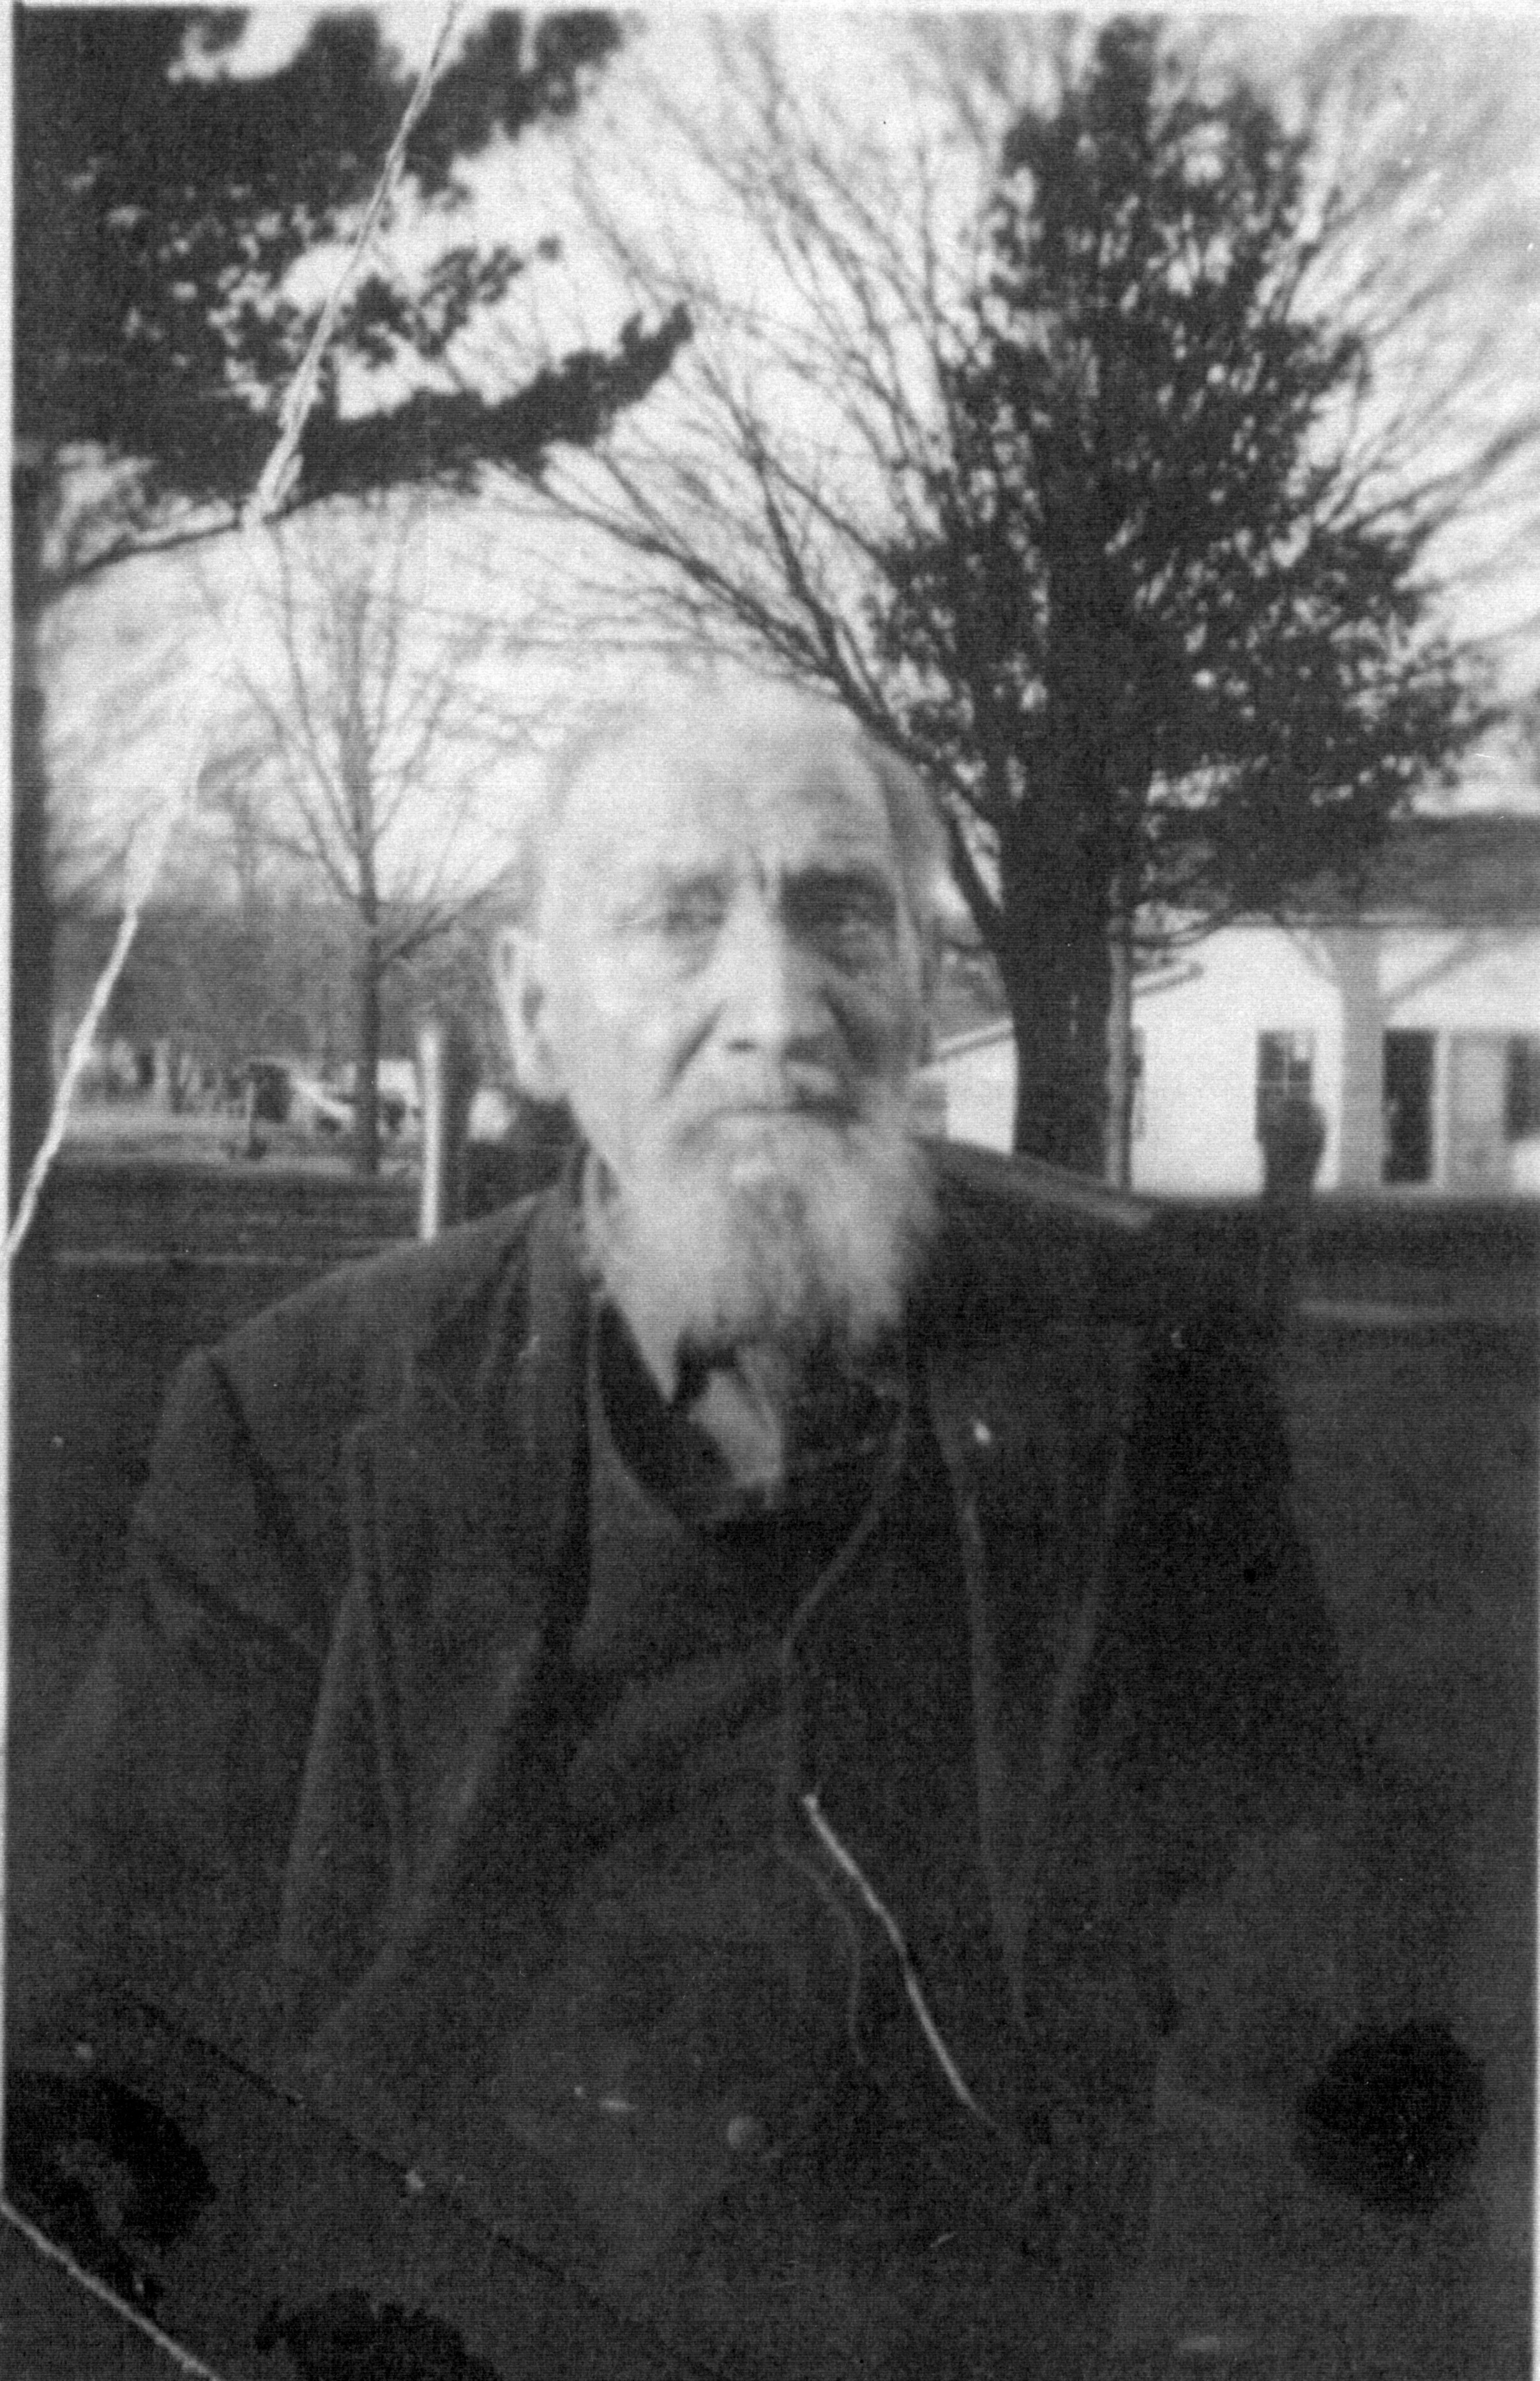 Emanuel Hallman